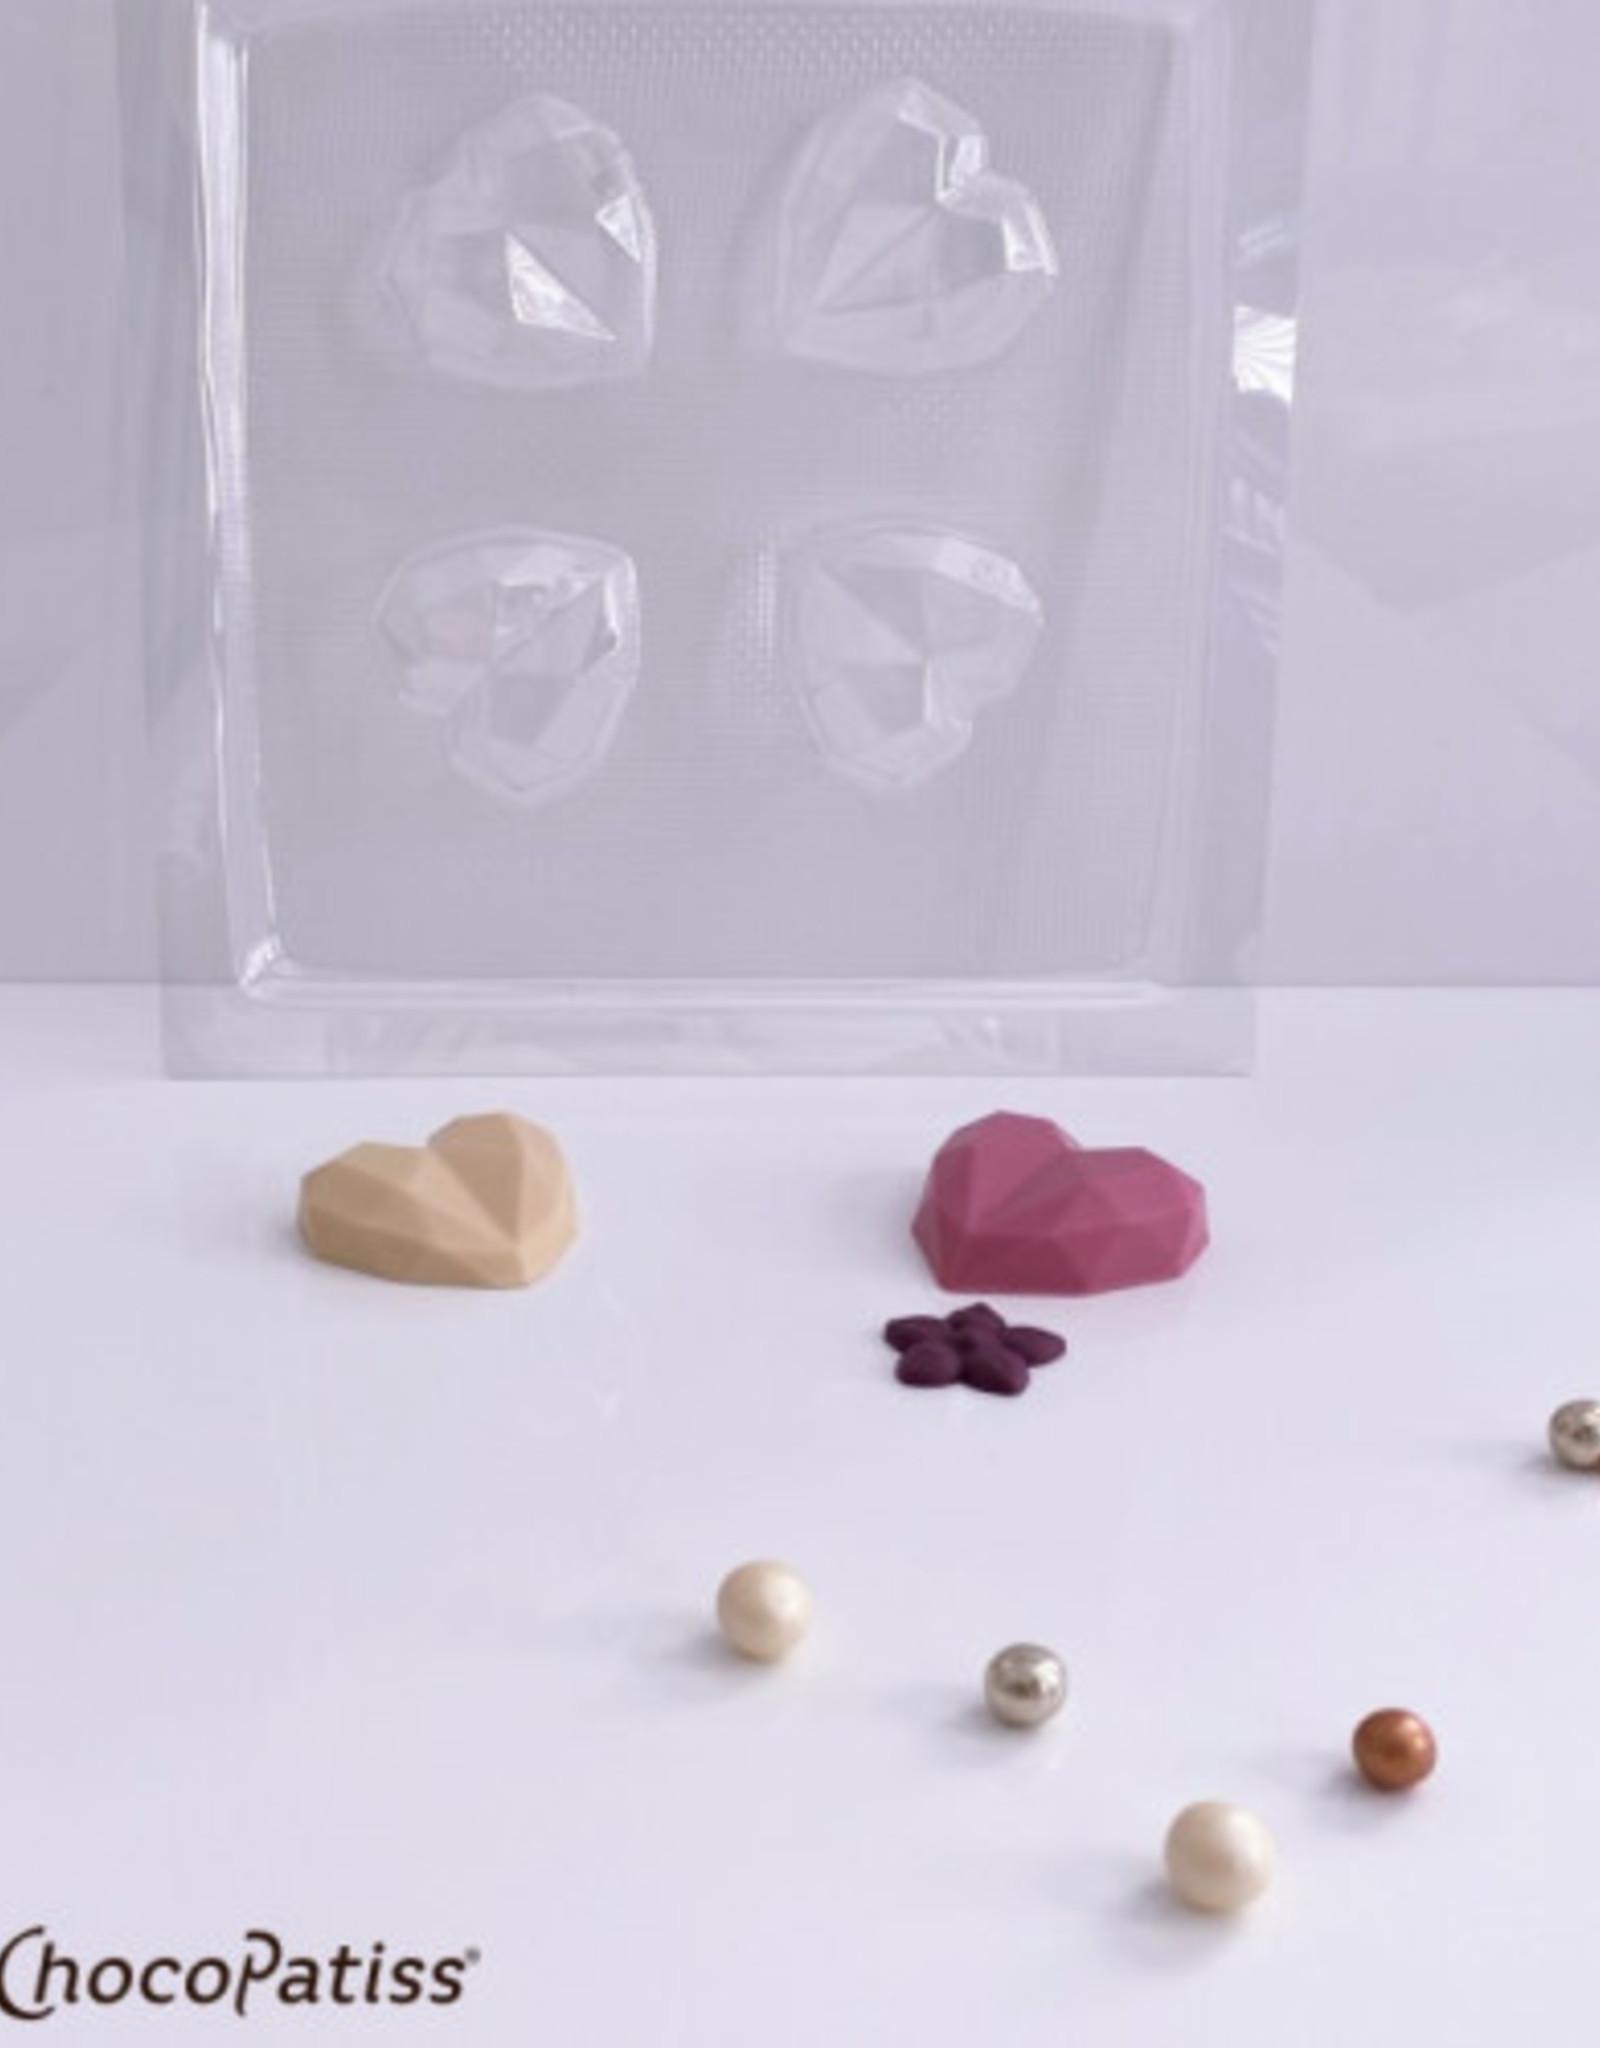 ChocoPatiss Chocolade Holvorm Geo Hart (4x) 5,5x5,5x1,5cm